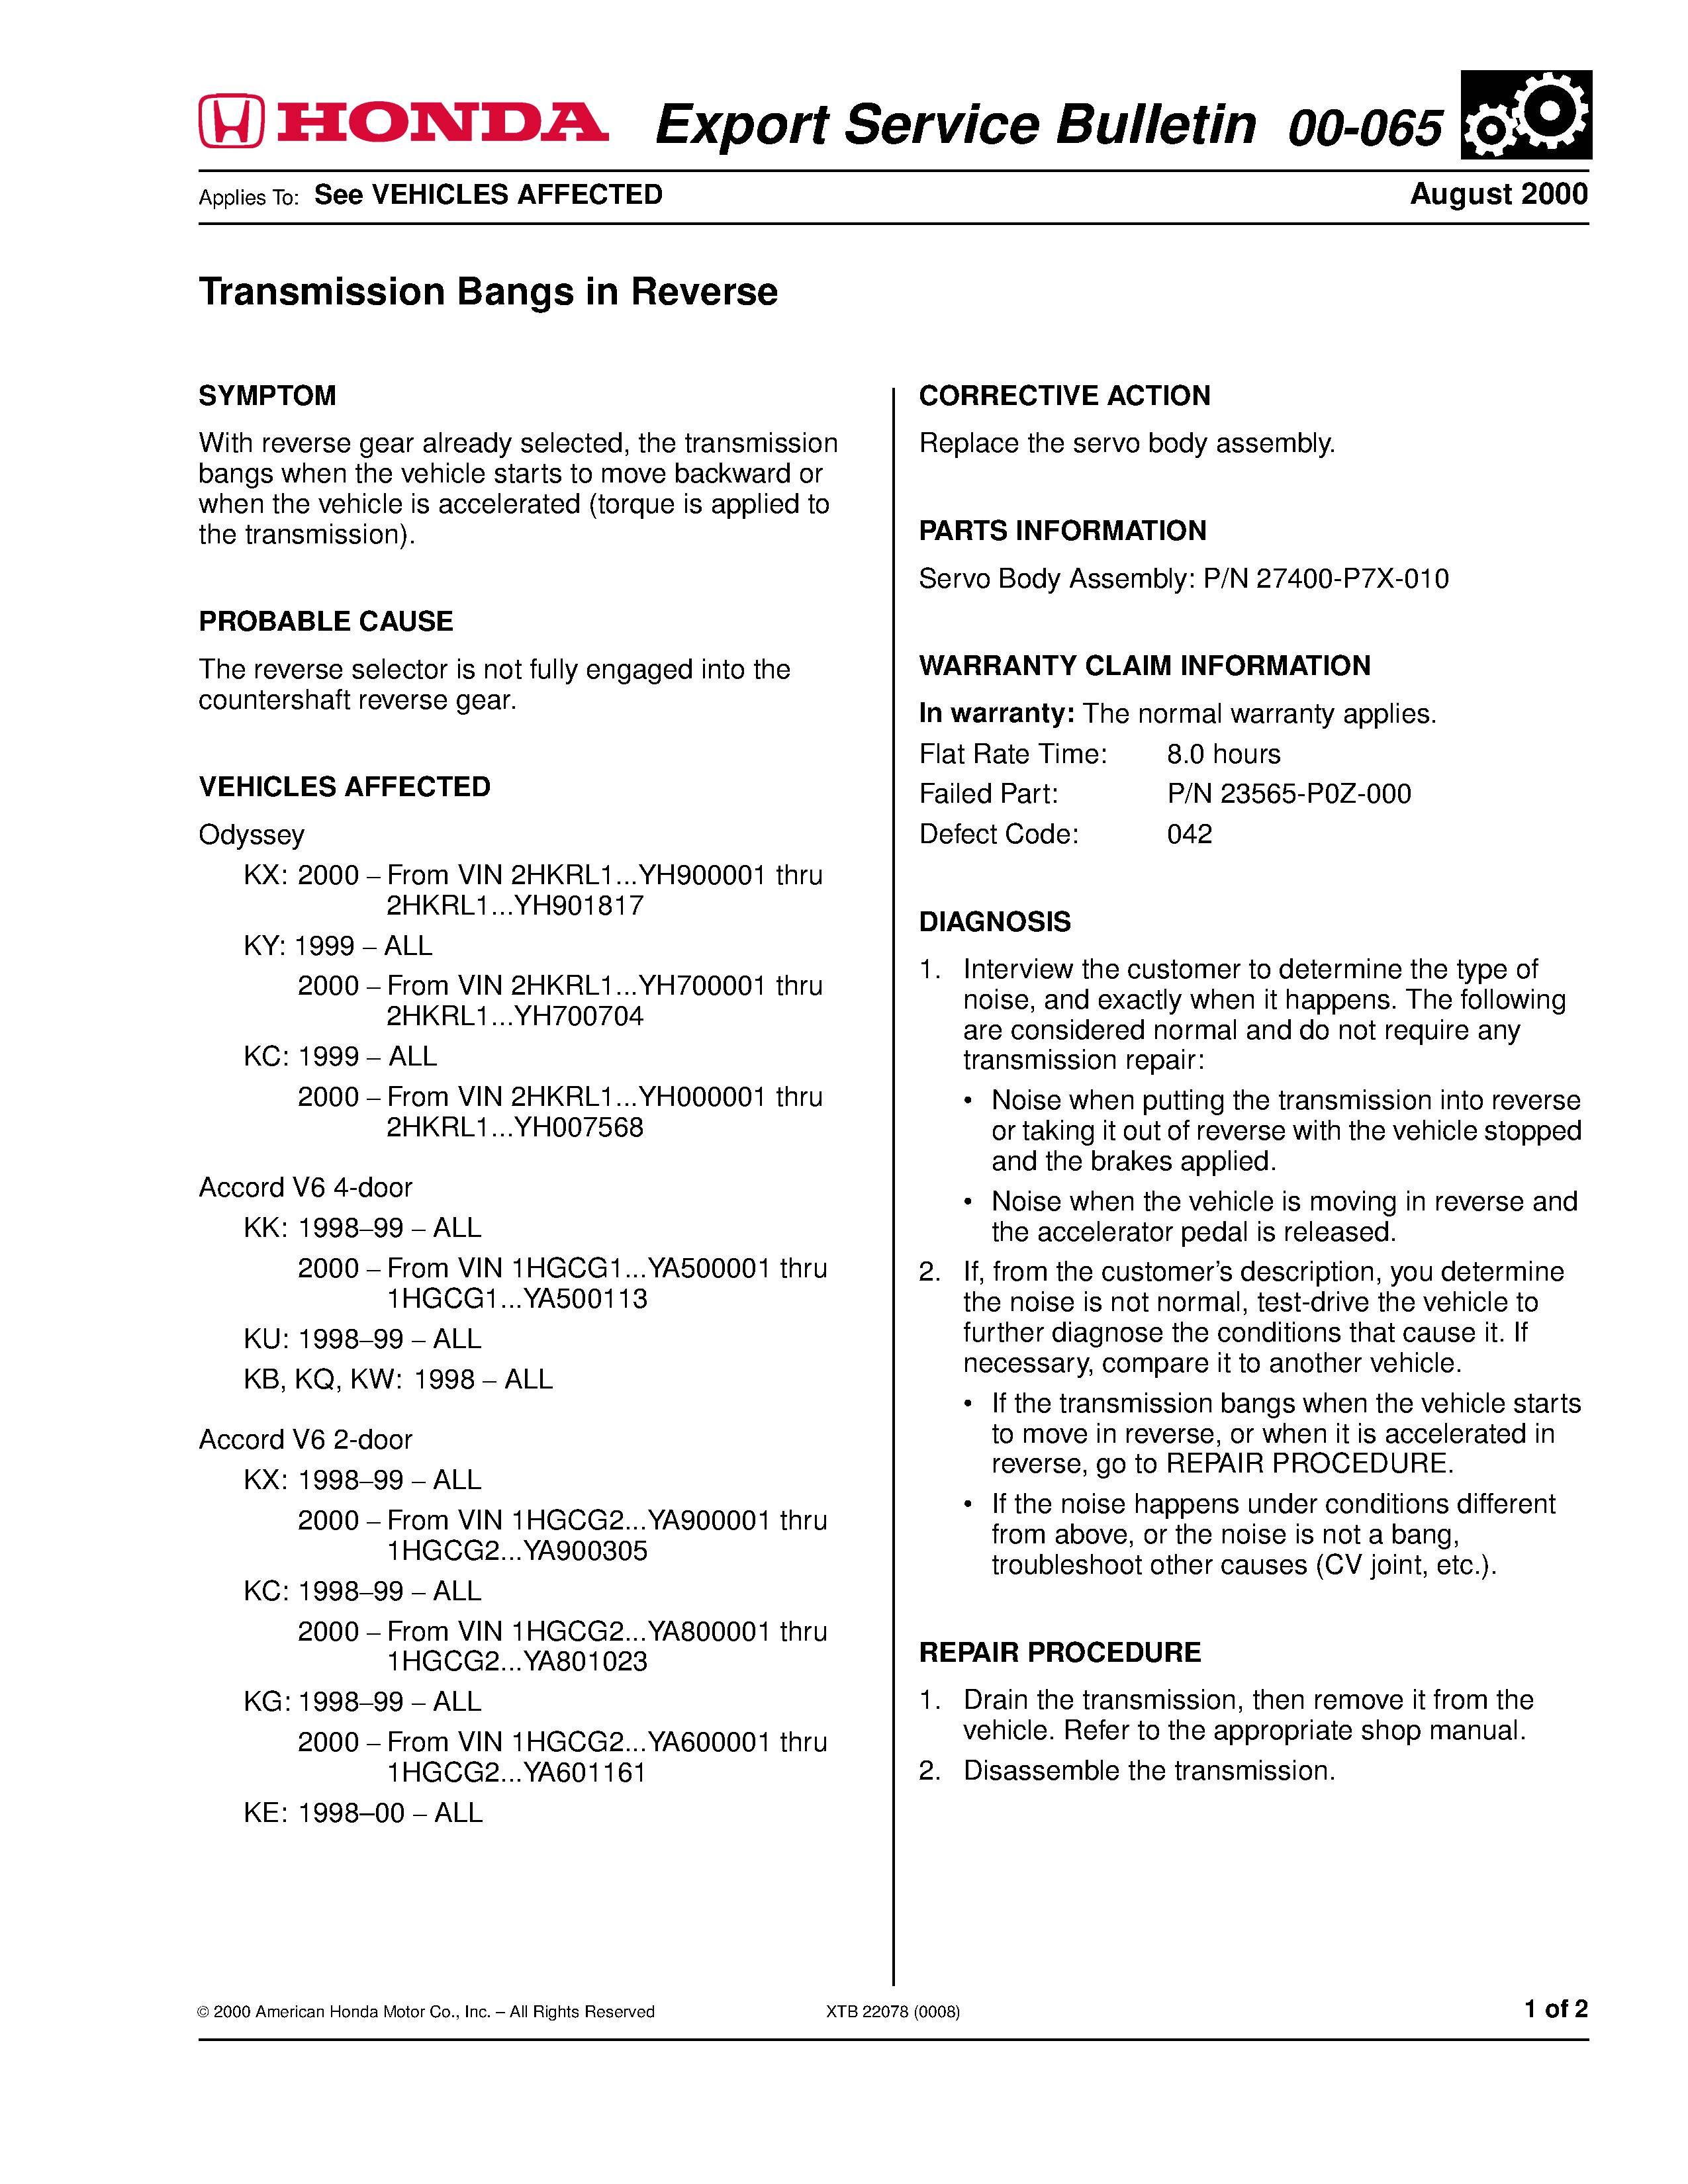 1999 2001 Accord Manual Service